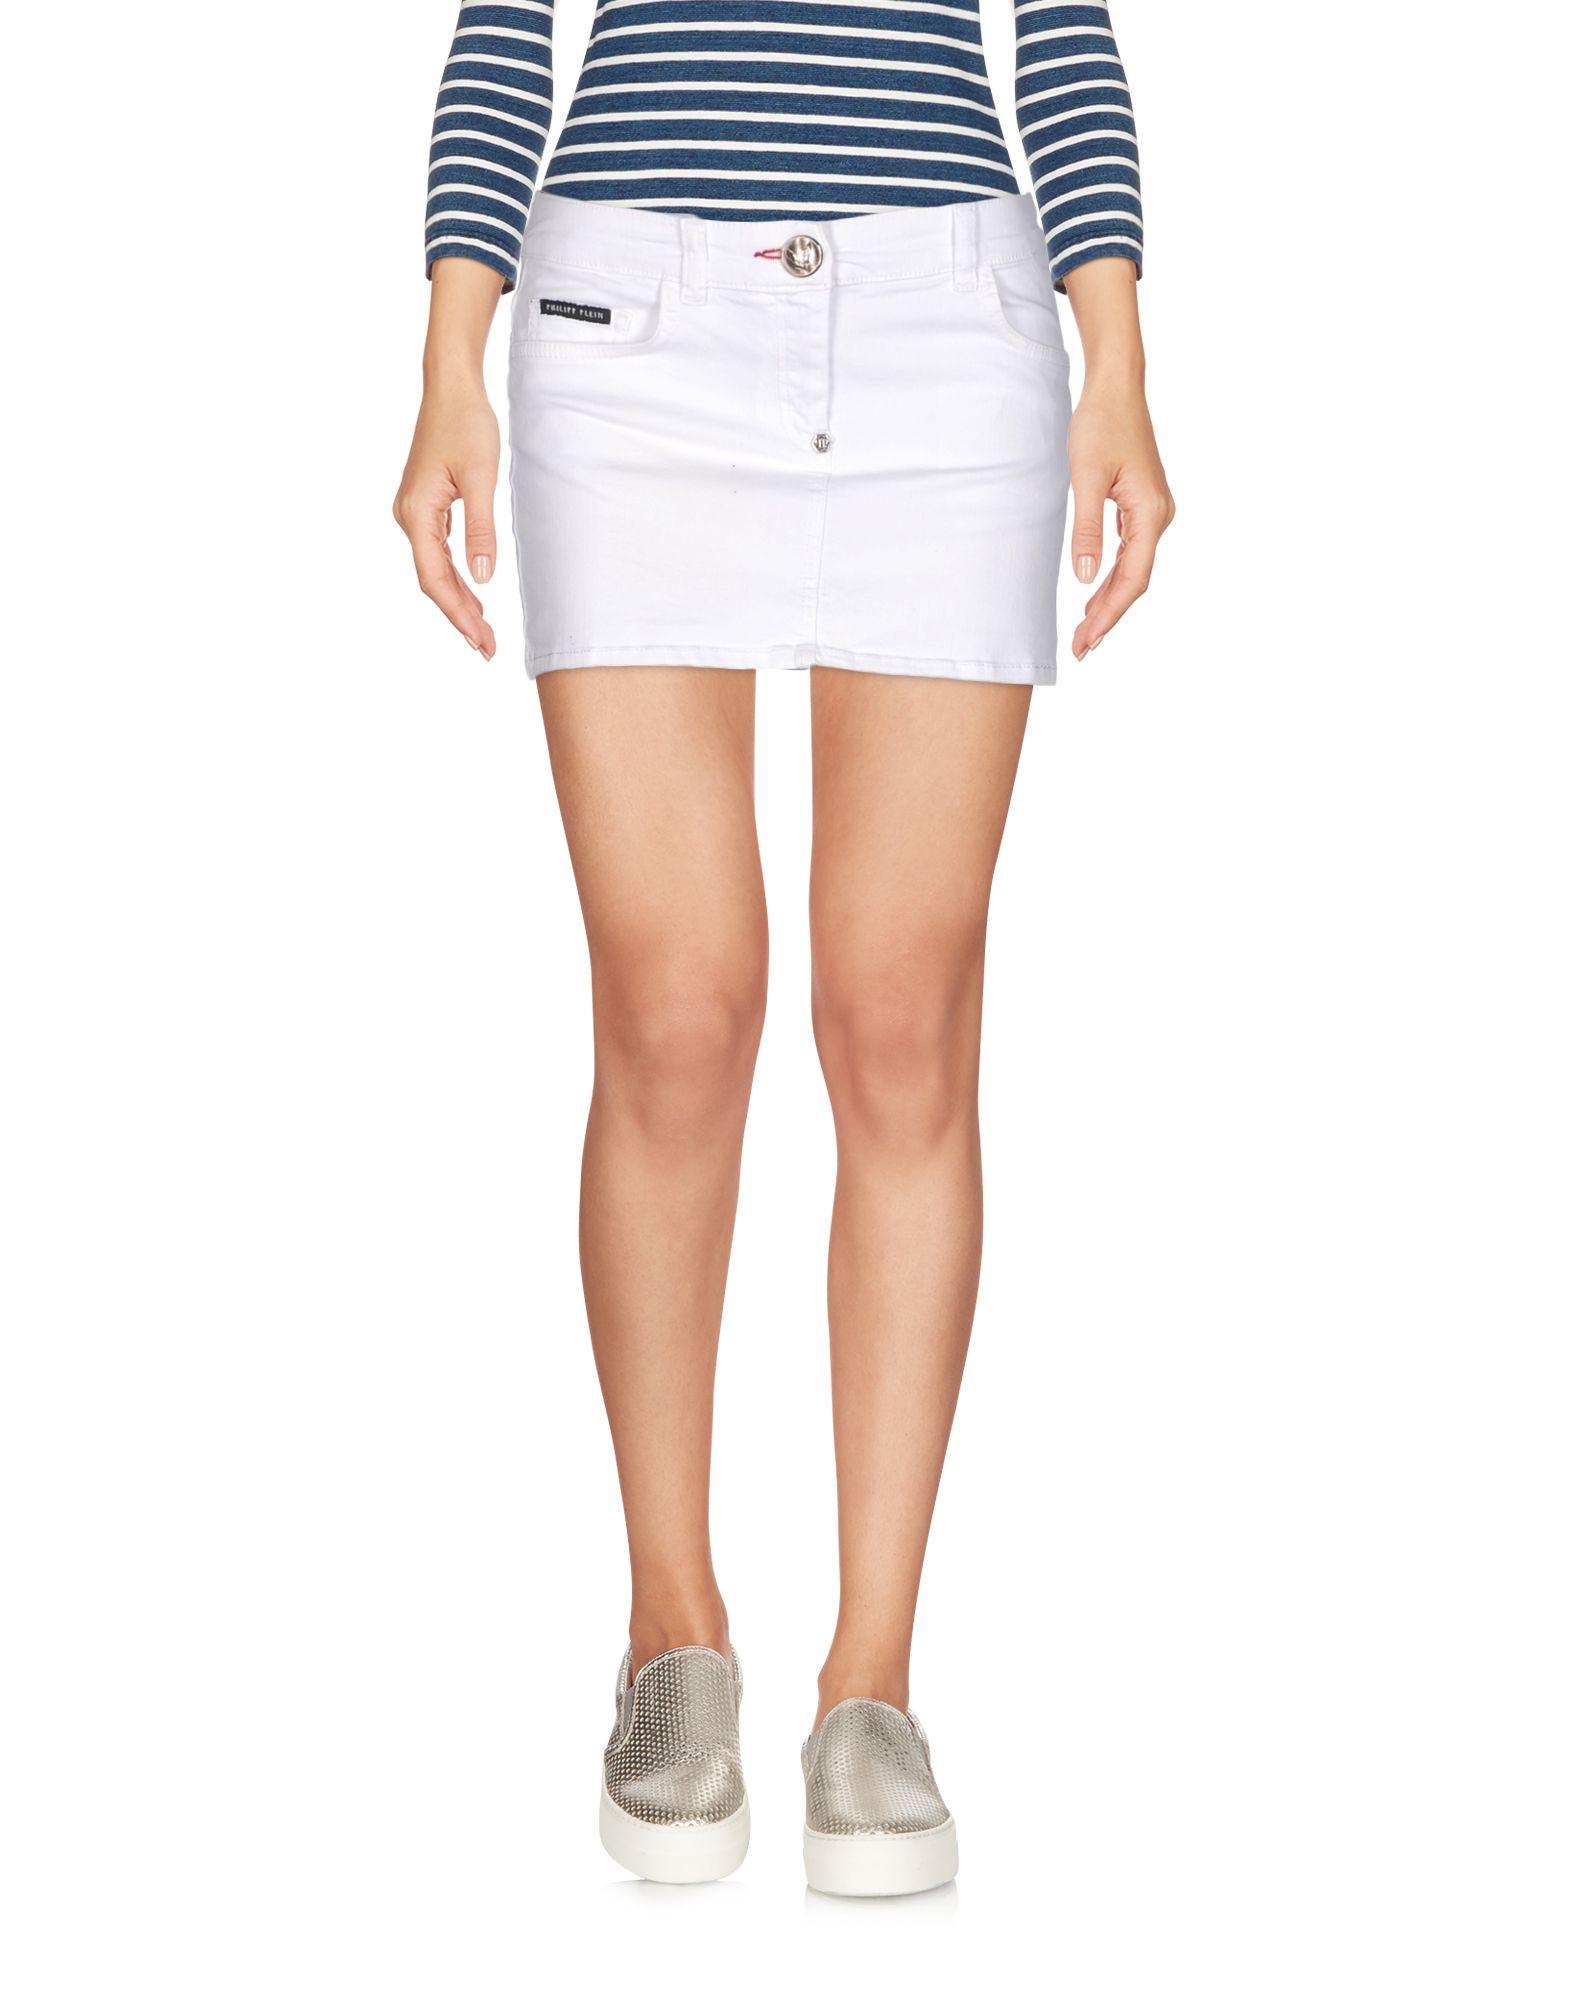 Gonna Jeans Philipp Plein Donna - Acquista online su z0O3imu